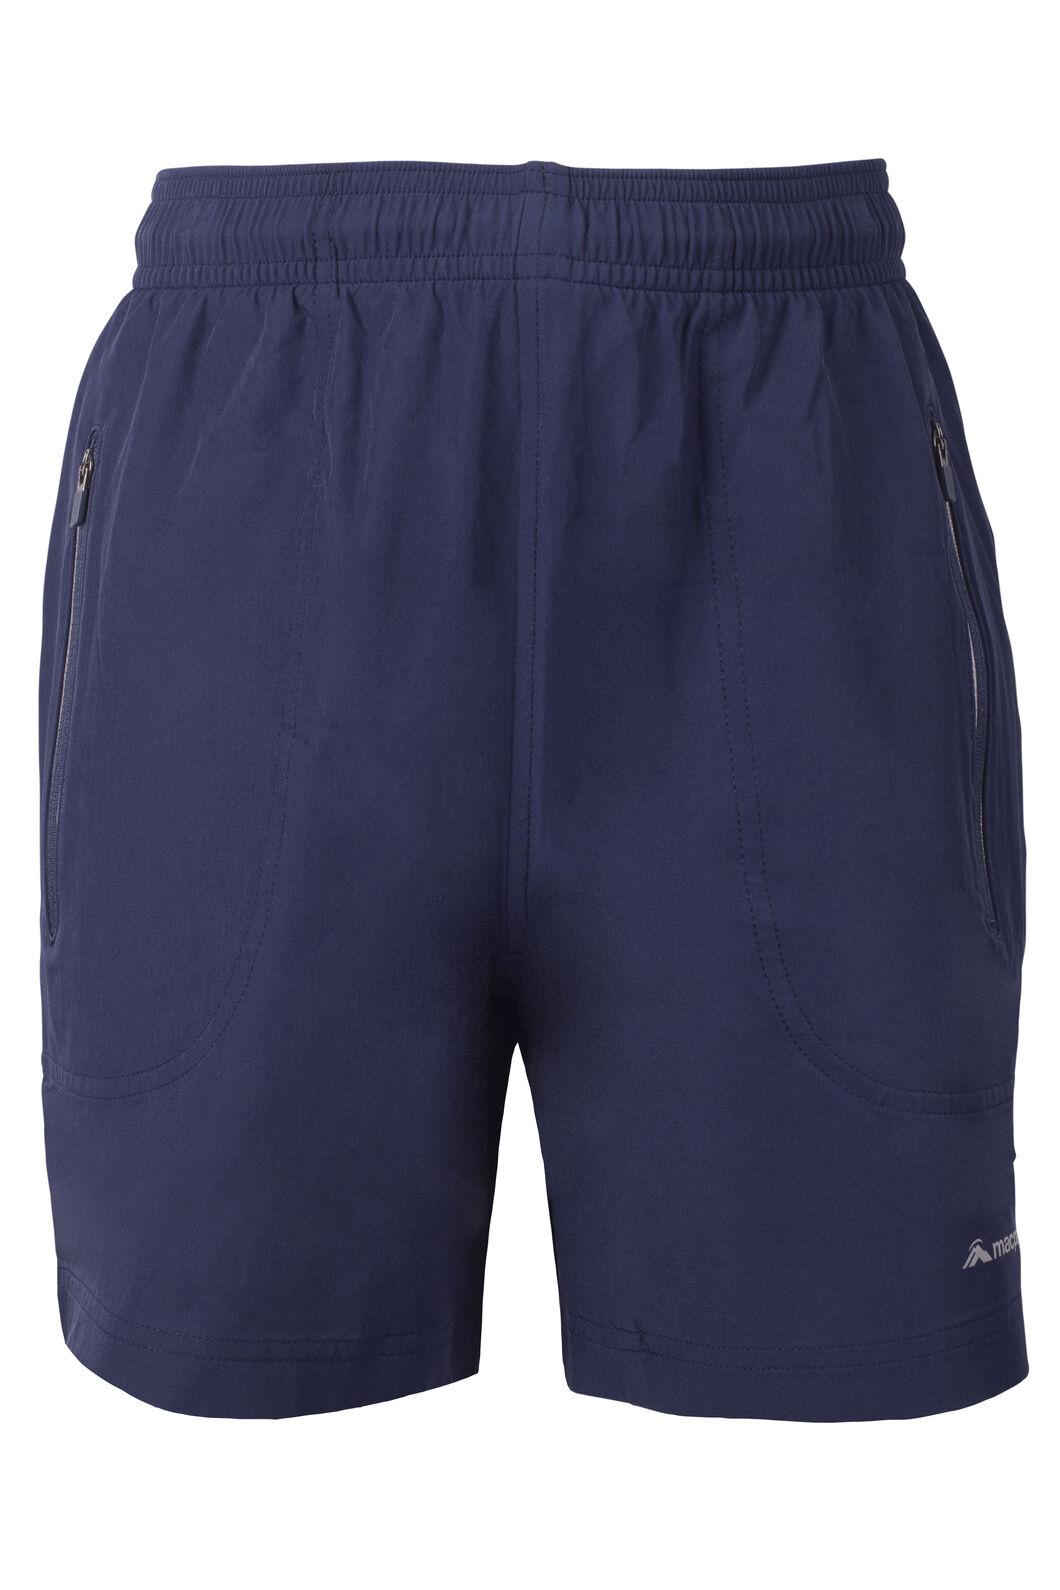 Fast Track Shorts - Kids', Black Iris, hi-res